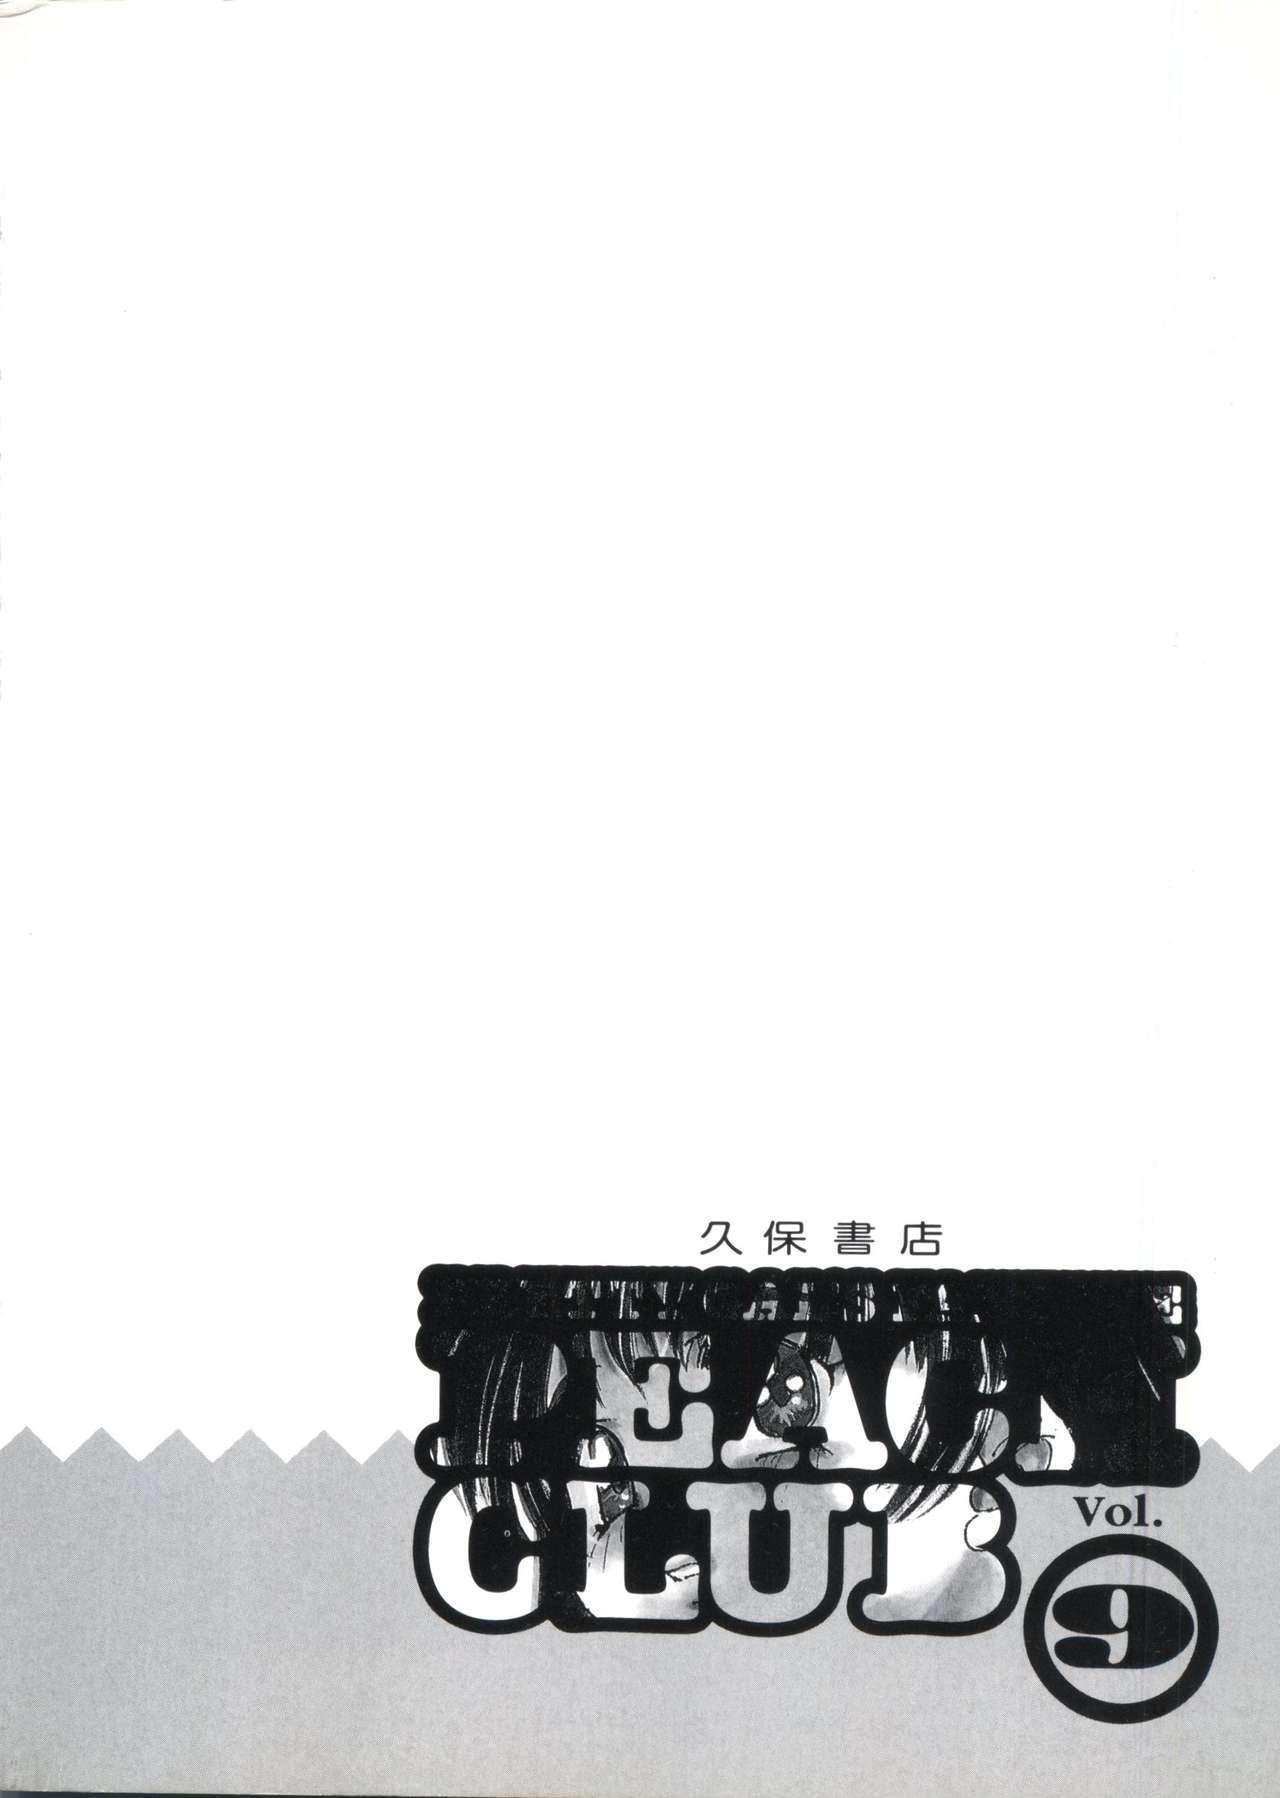 Bishoujo Doujin Peach Club - Pretty Gal's Fanzine Peach Club 9 146